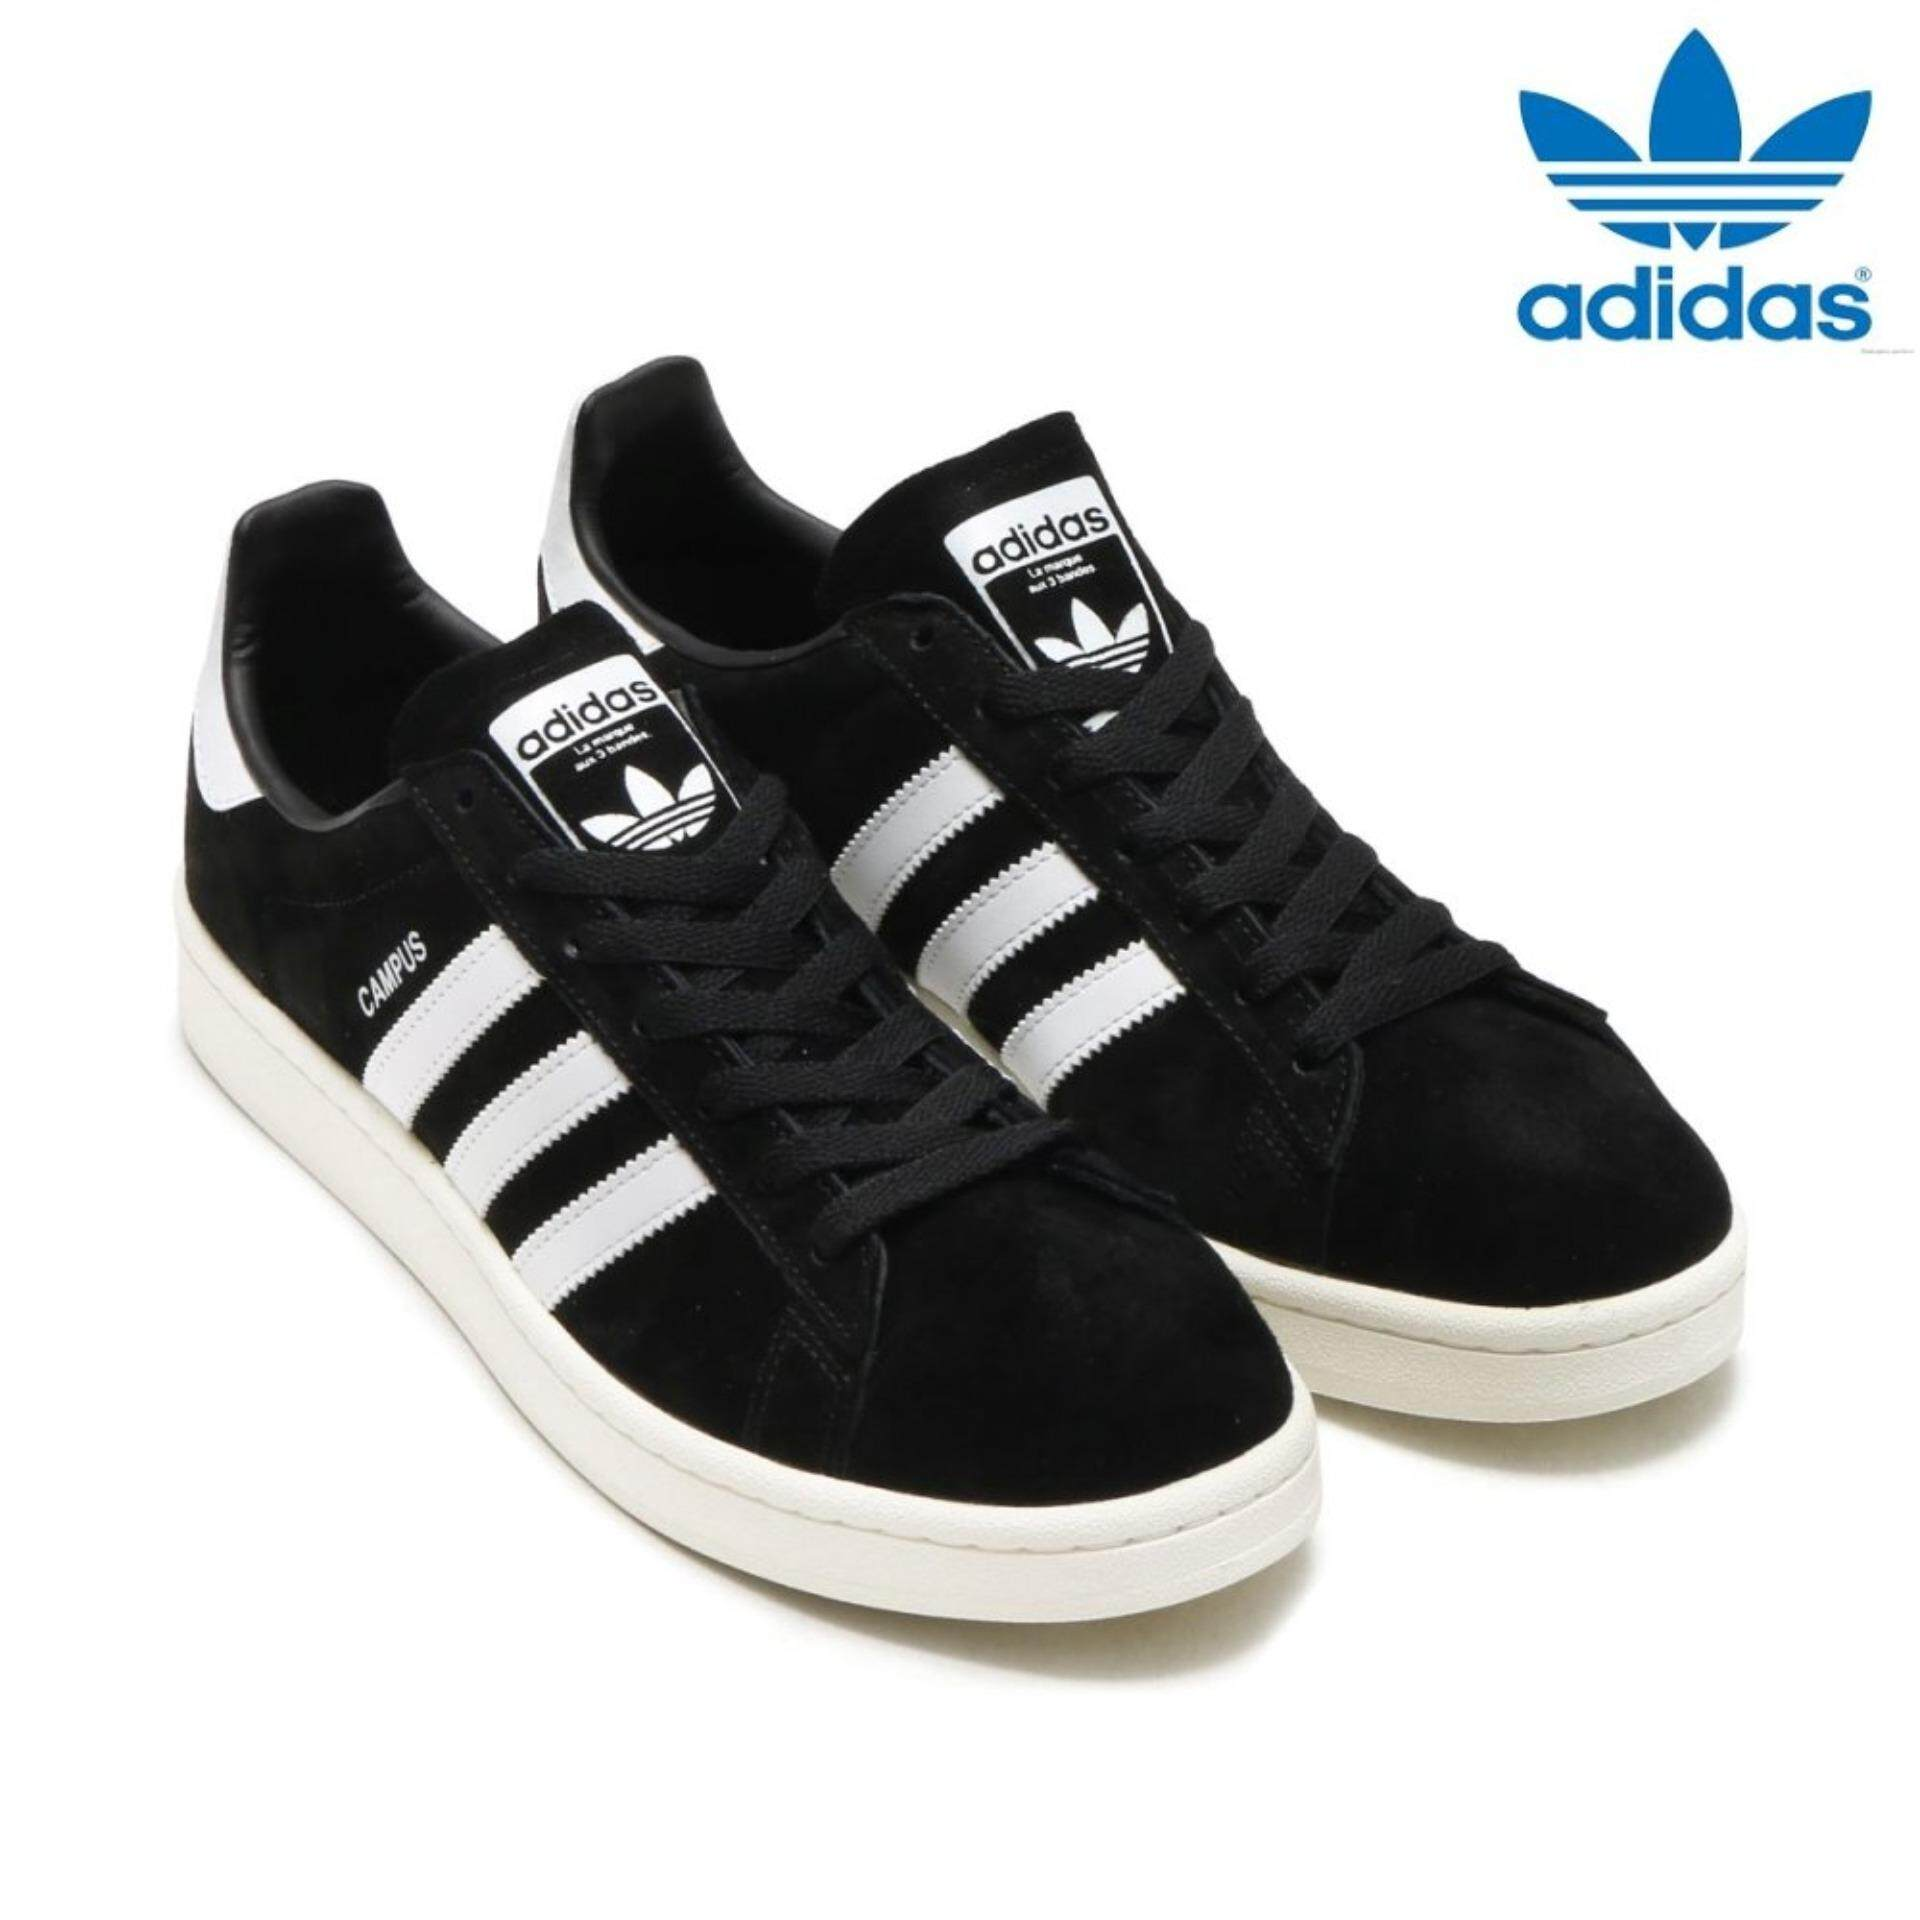 Adidas Uniseks Originals BZ0084 Kampus Sepatu Hitam/Putih 100% Asli-Internasional